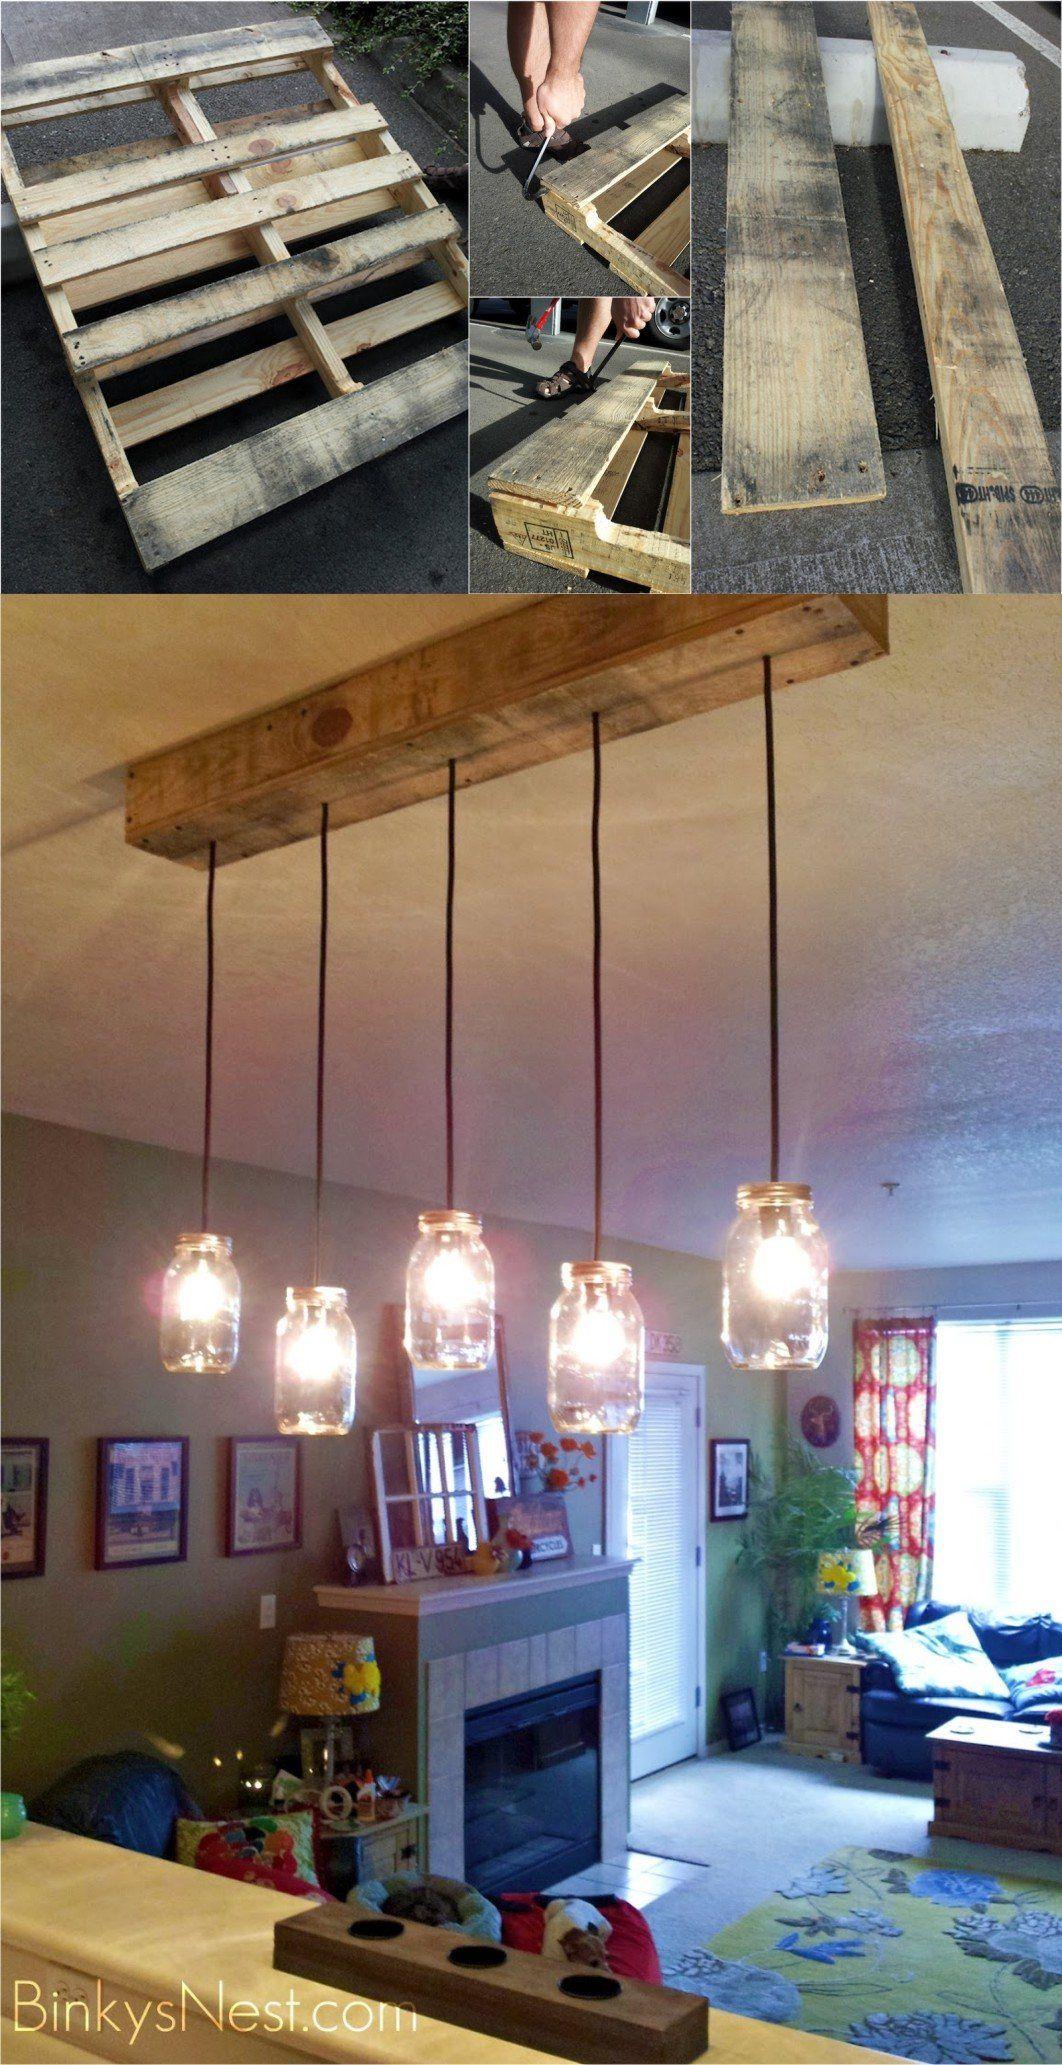 ampli tie una ingeniosa corbata decoraci n l mparas. Black Bedroom Furniture Sets. Home Design Ideas